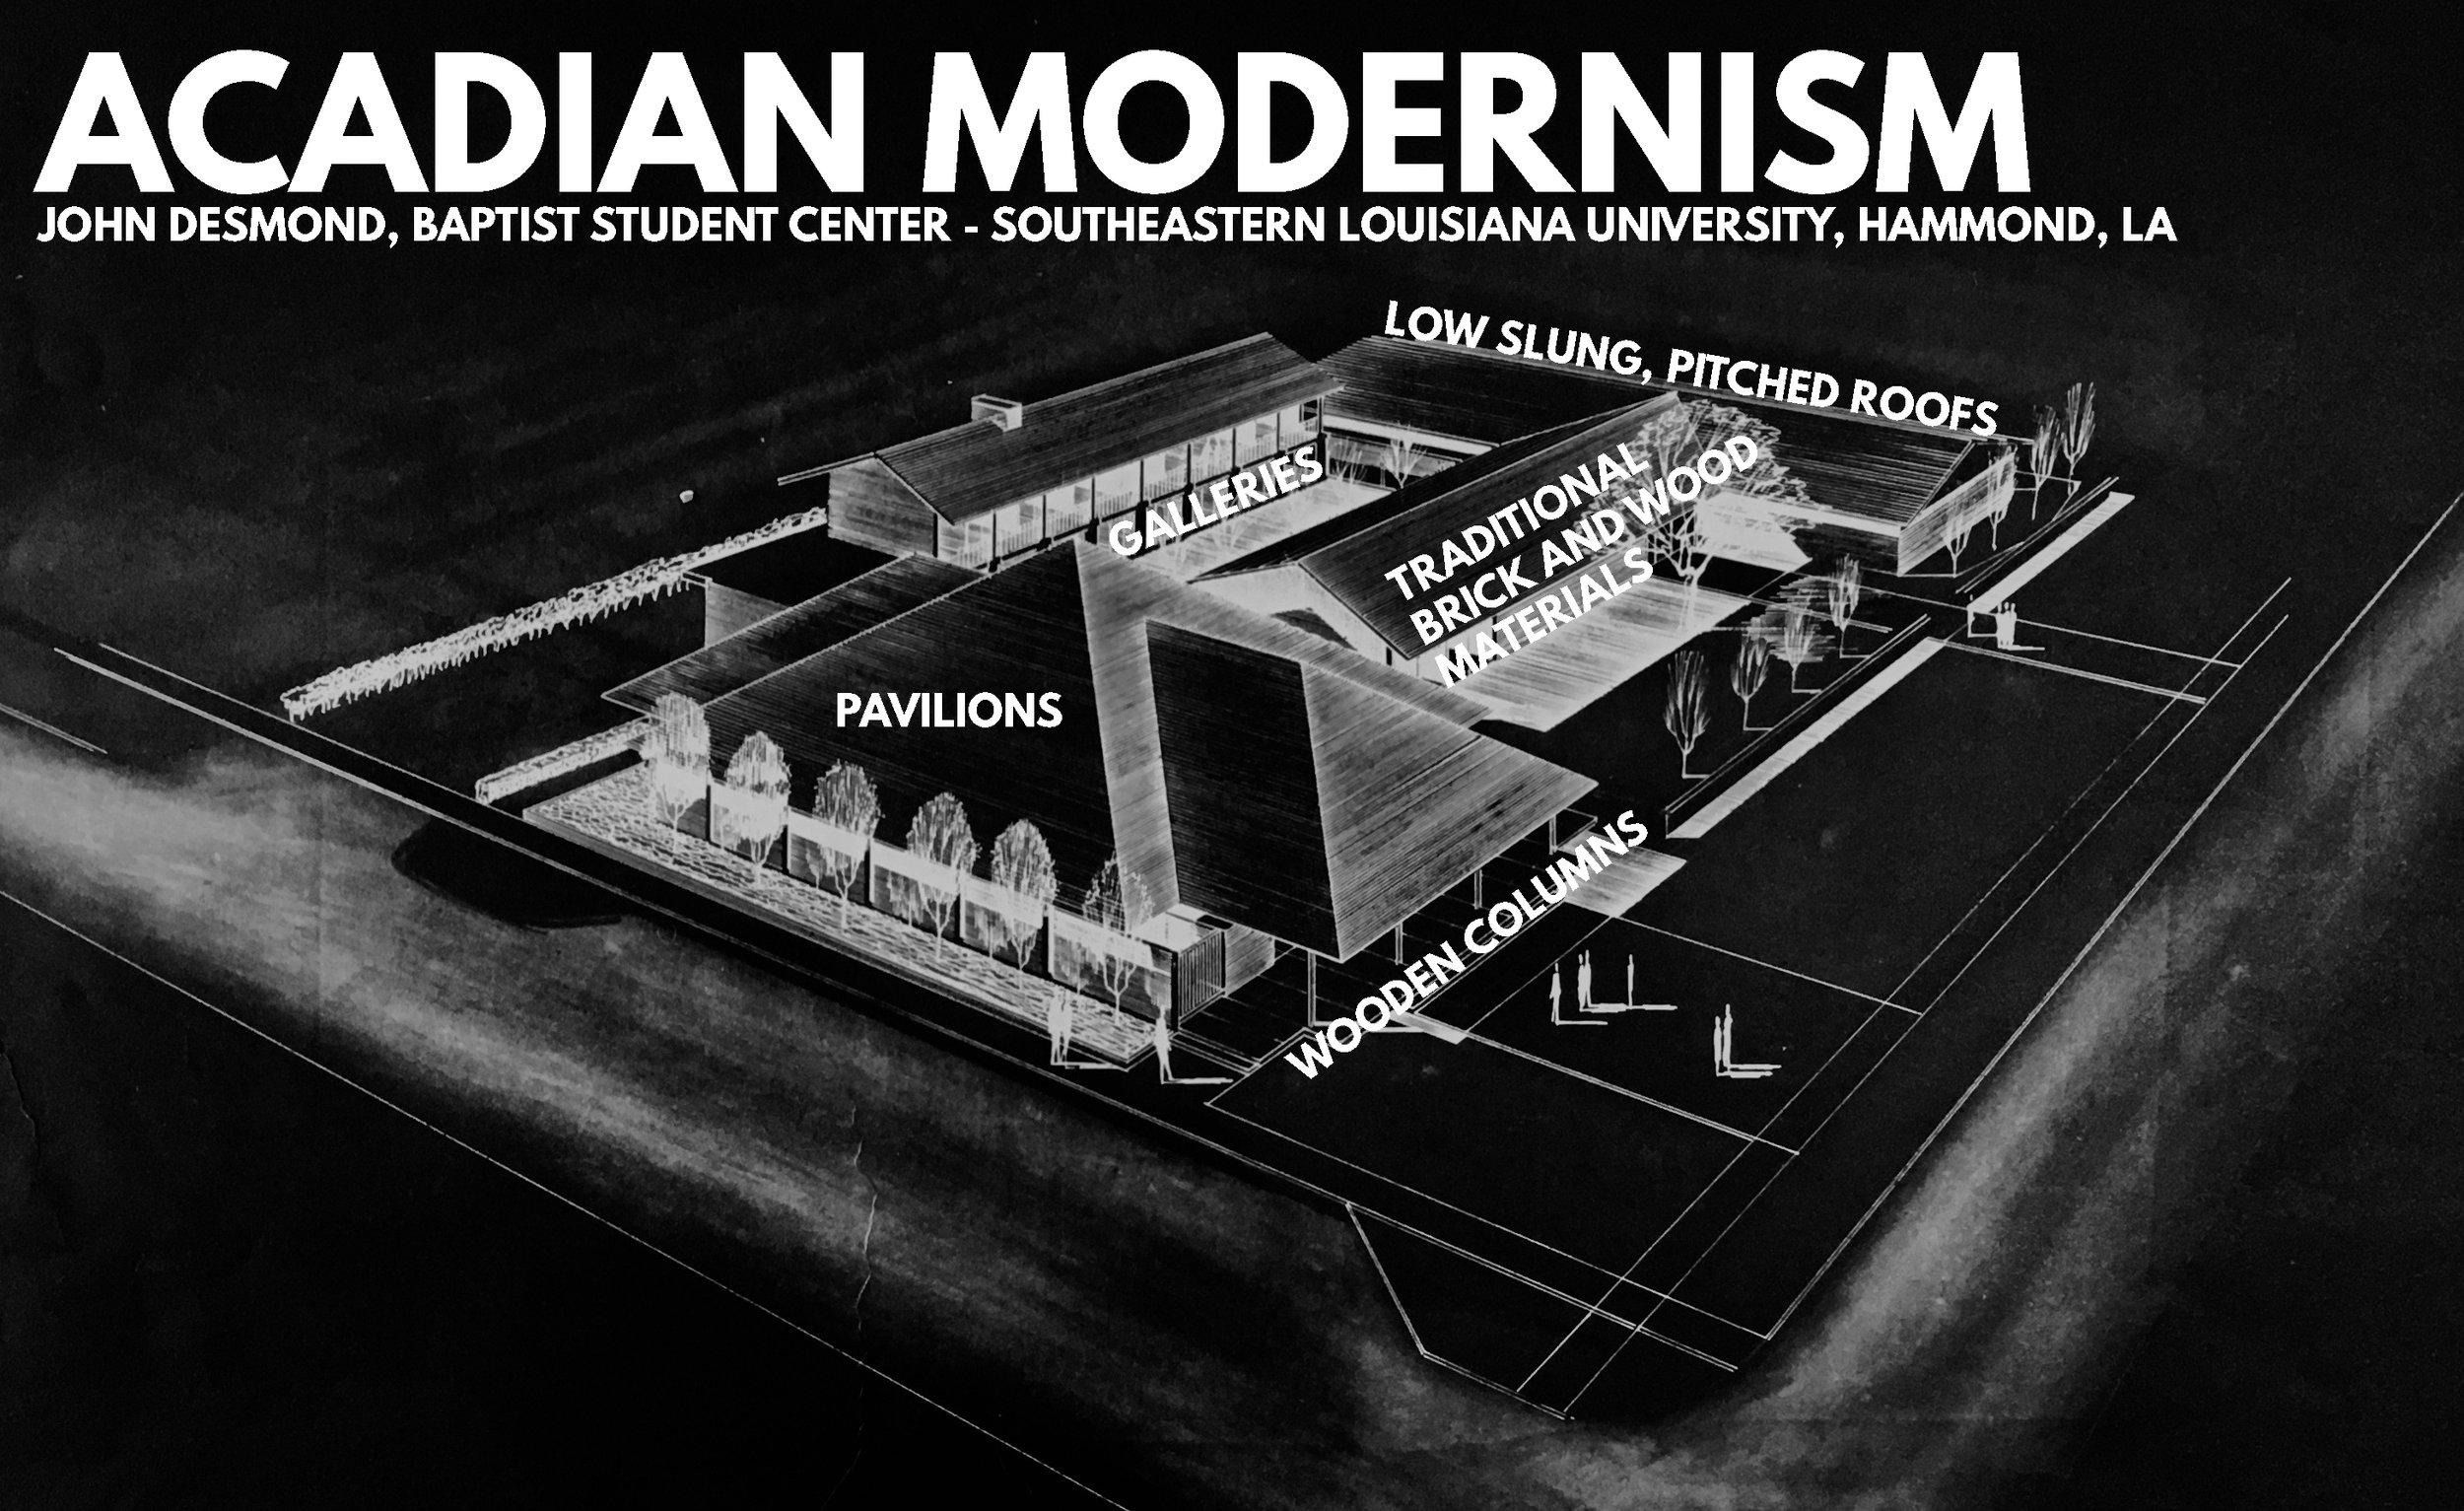 spotting acadian modernism copy.jpg